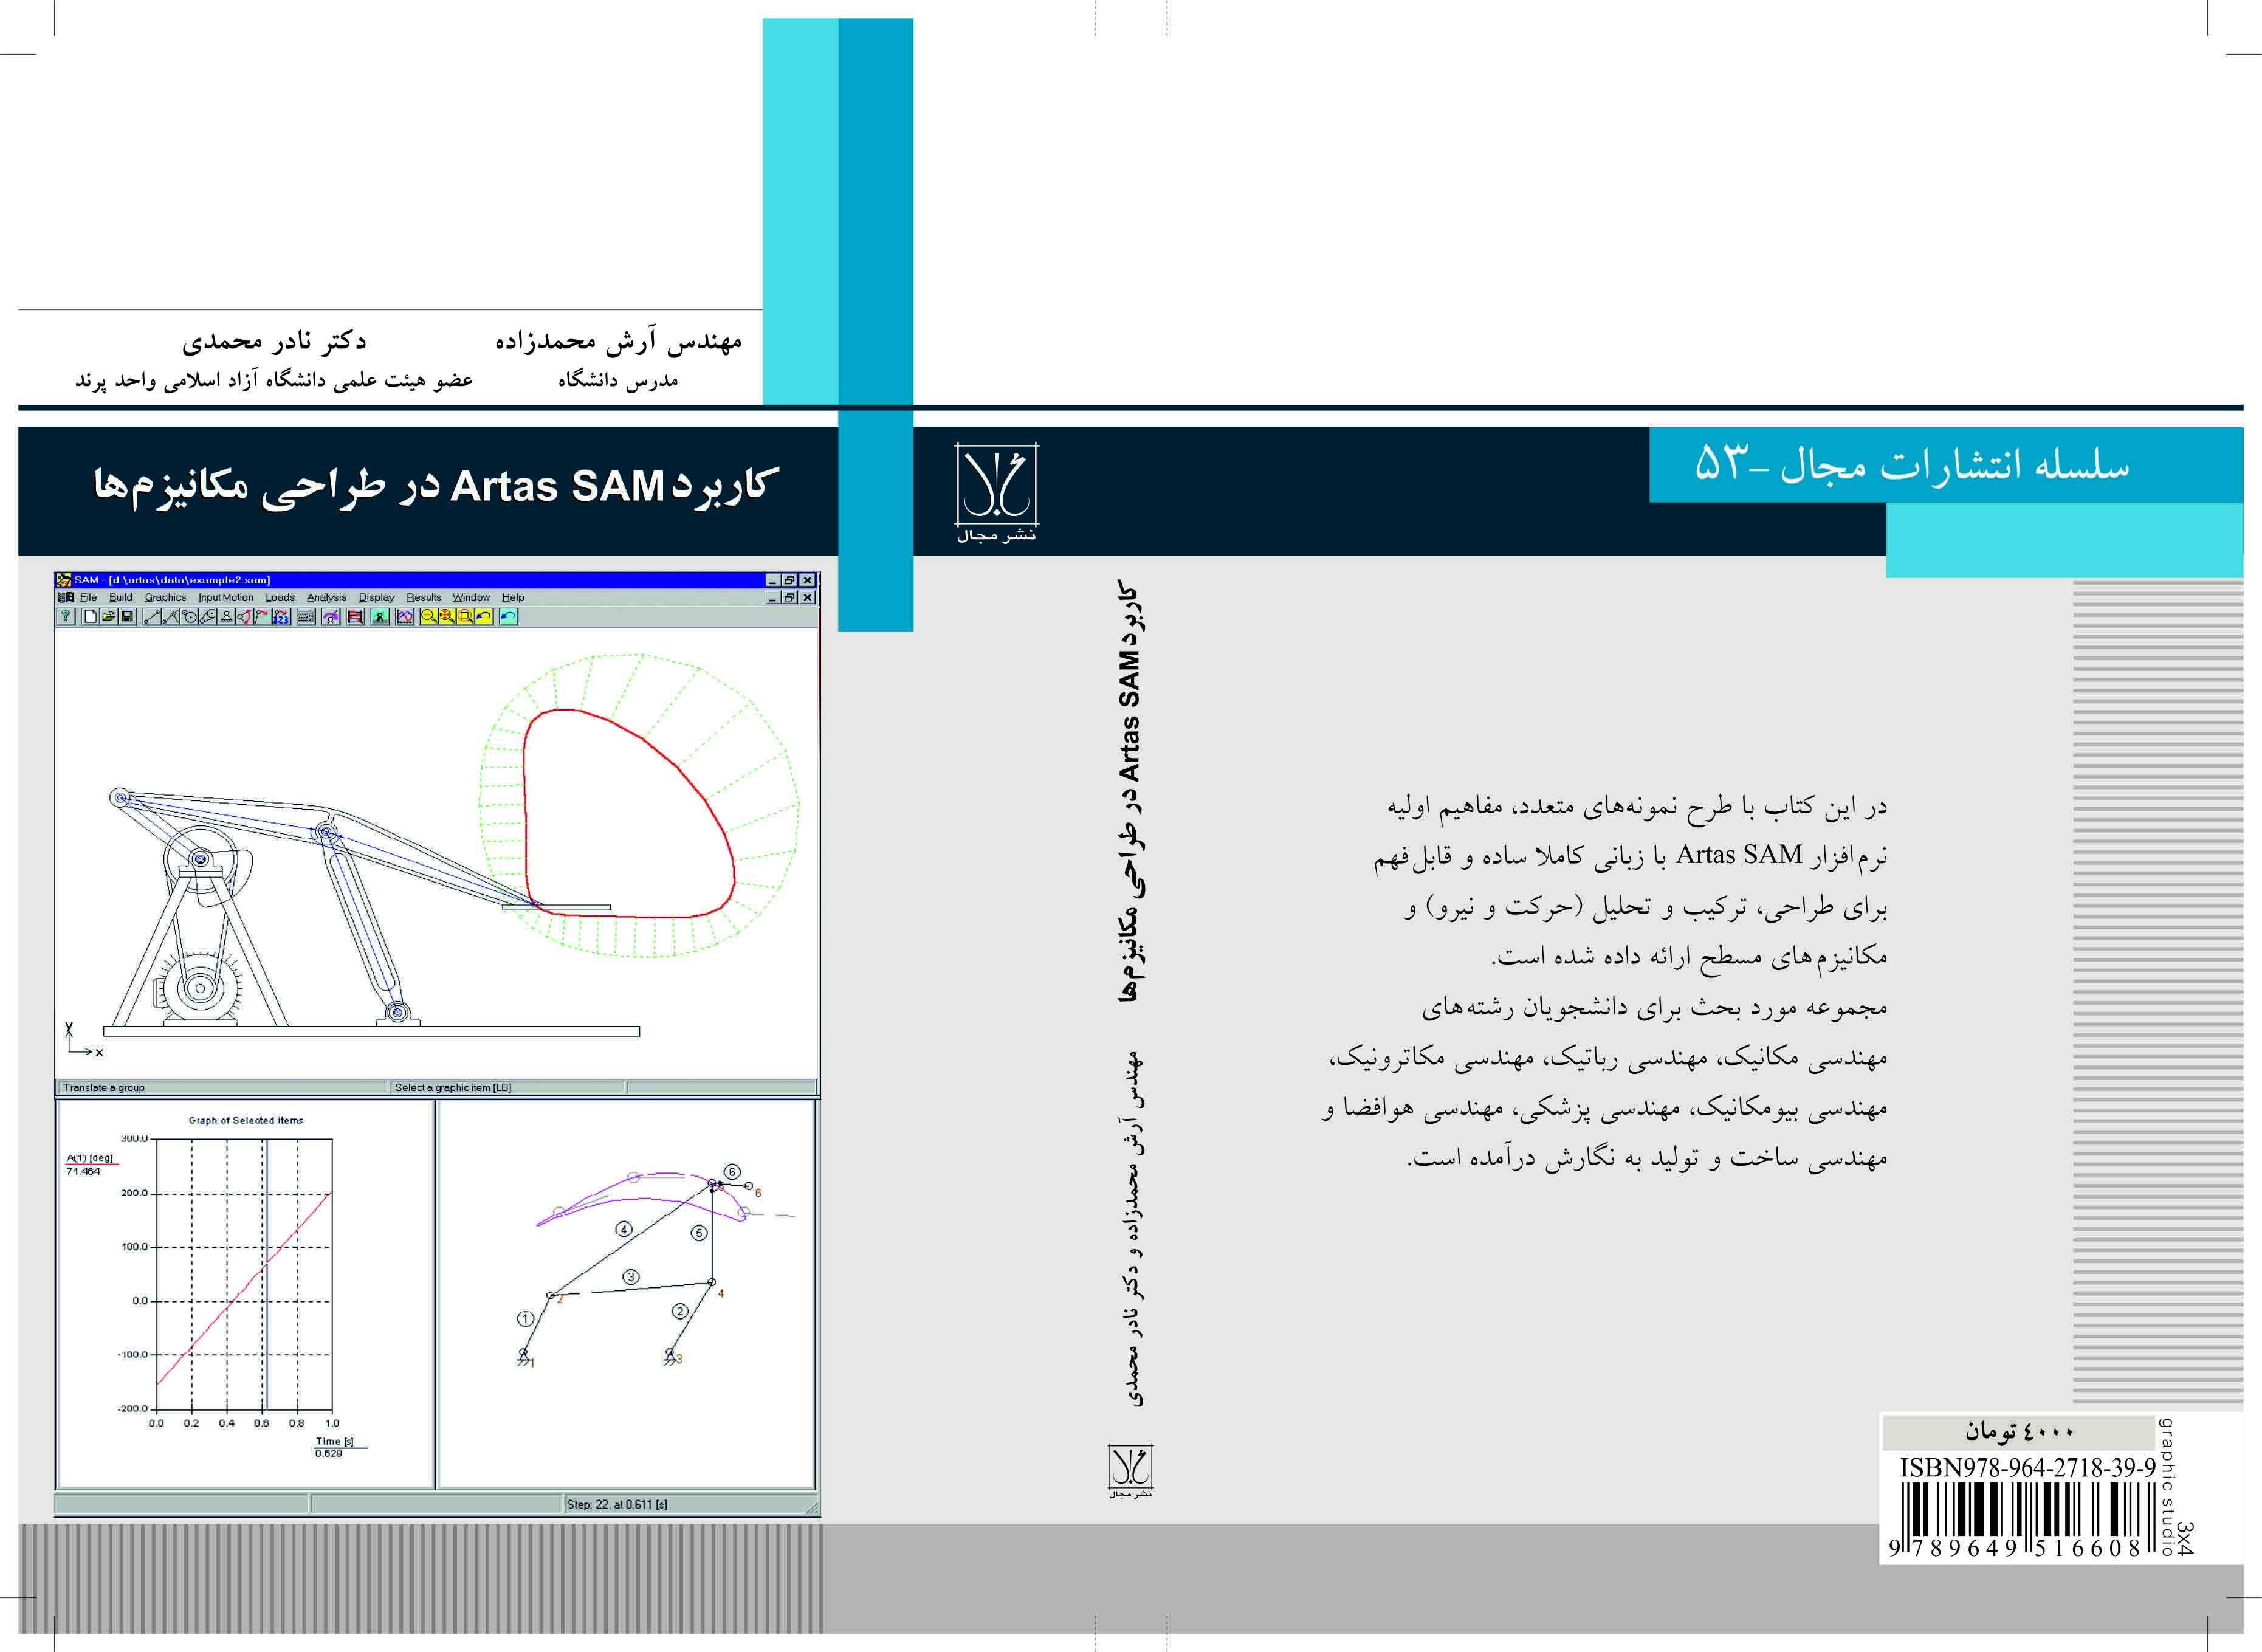 http://arashmohammadzadeh1.persiangig.com/image/ArtasSAM%20%231%20(2).jpg